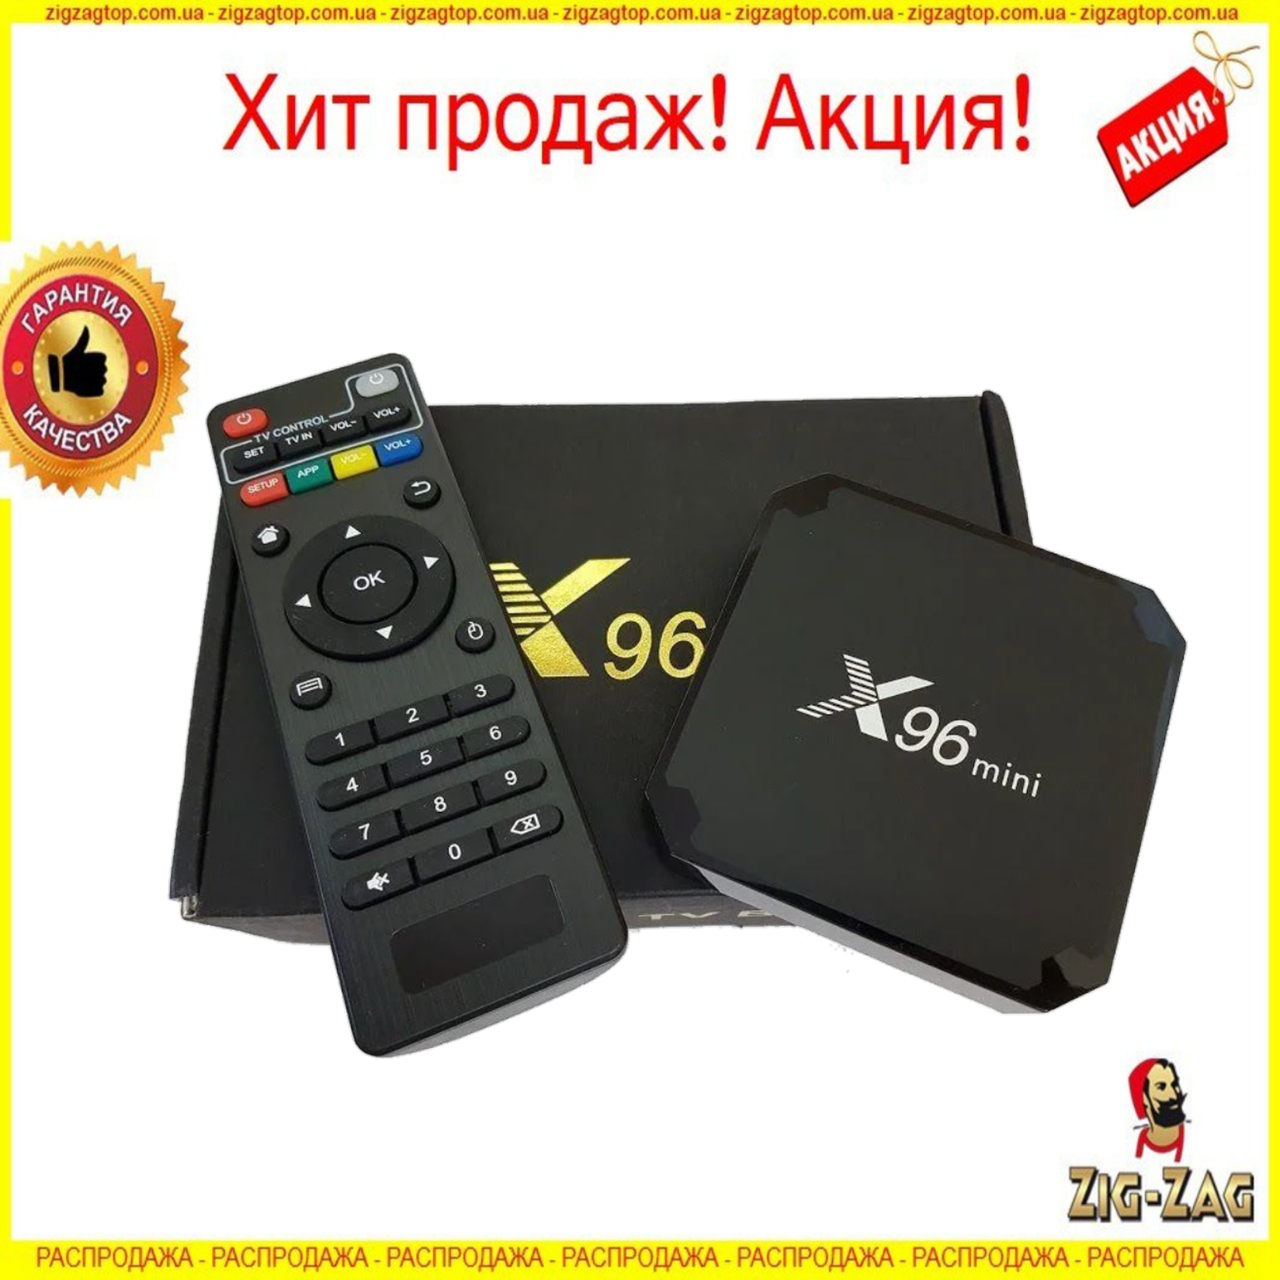 Приставка Смарт ТВ Бокс Smart TV Box x96 mini 4 Ядерная 2Гб/16Гб Андроид 7.1.2 Черный 4K ТВ и Фильмов до Игр